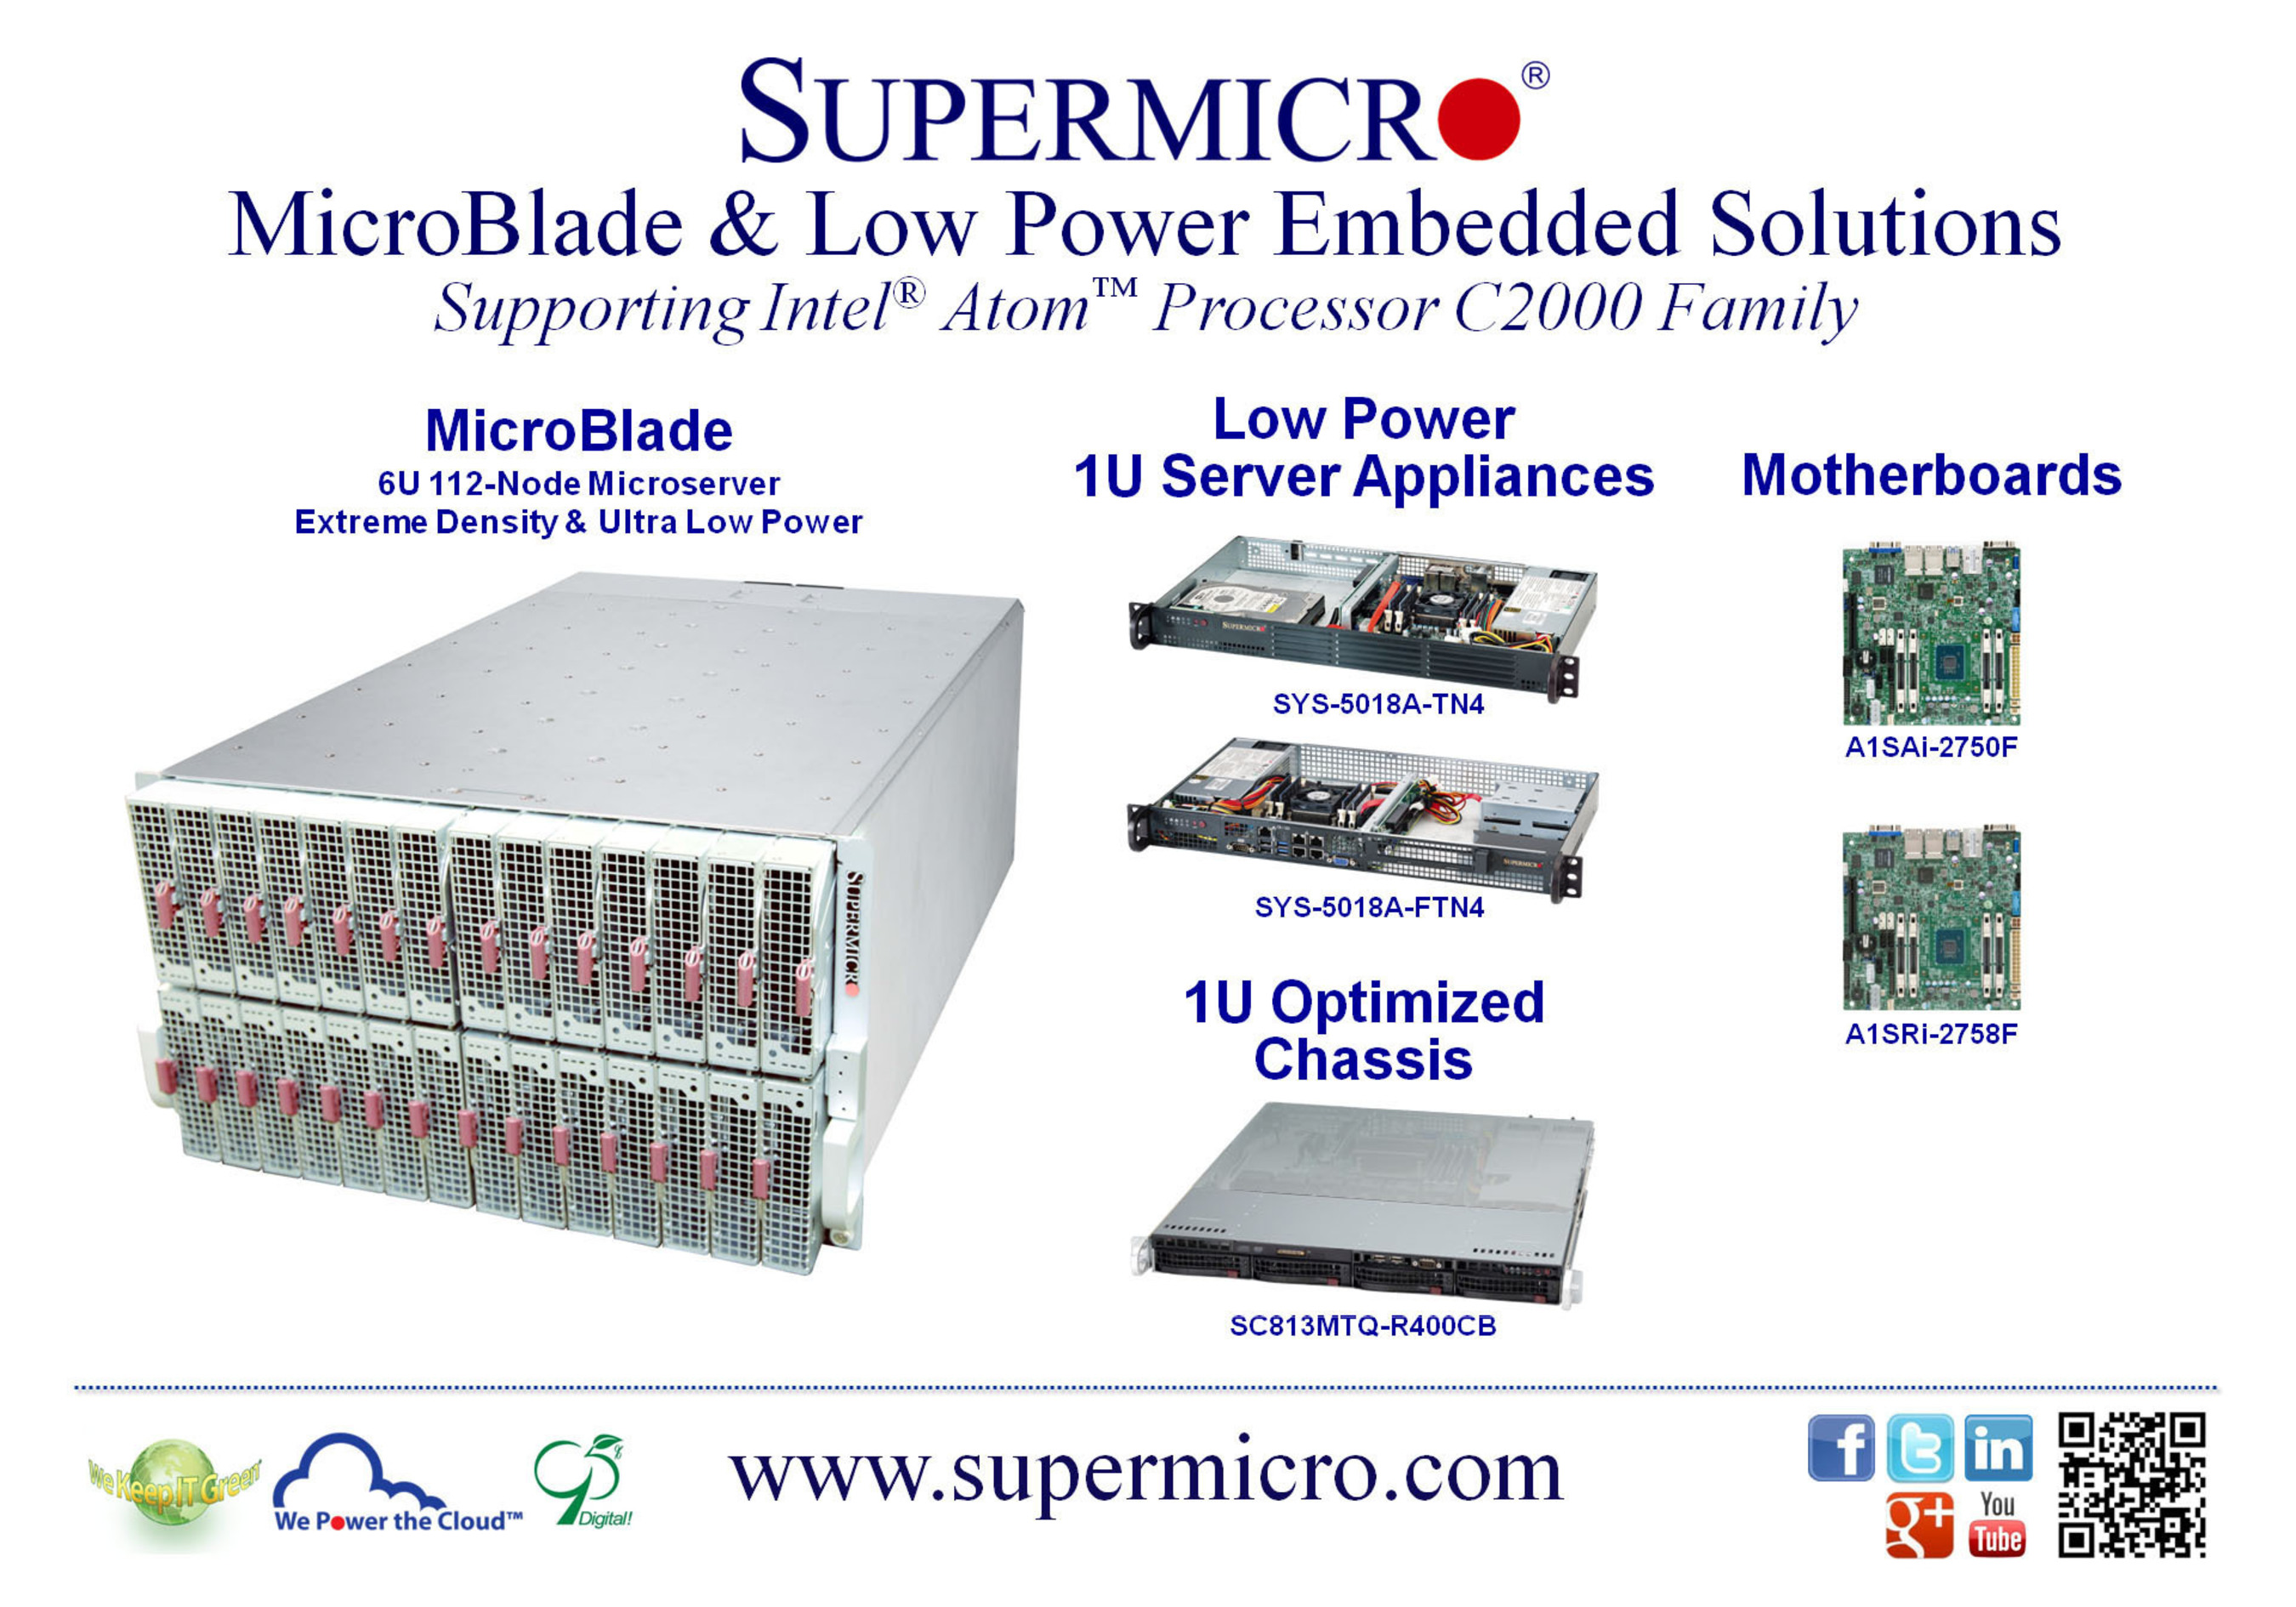 Supermicro® Debuts 6U 112-Node MicroBlade Server Featuring Intel® Atom™ Processor C2000